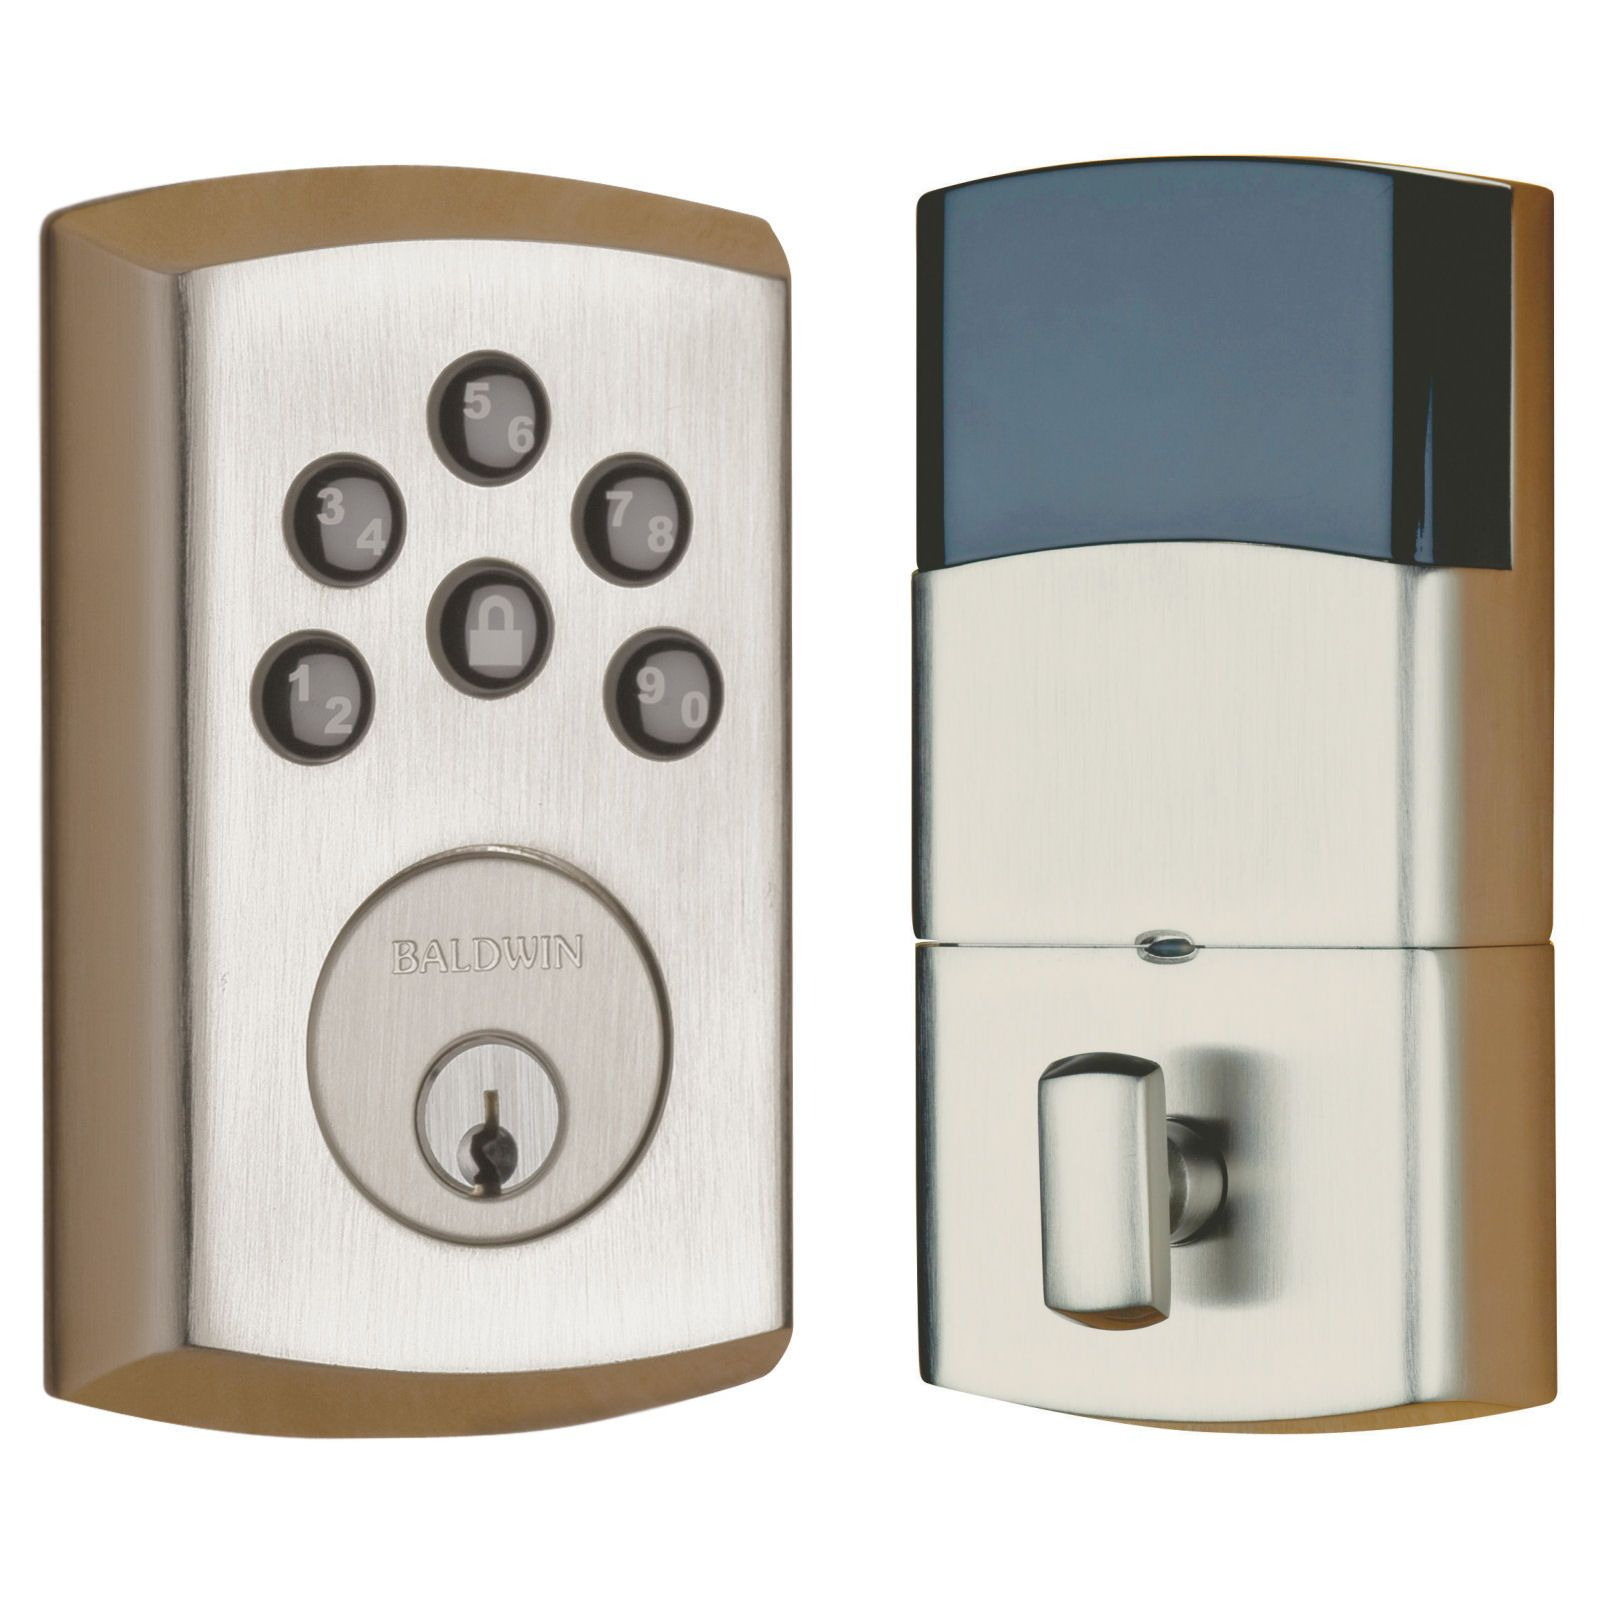 Baldwin Soho 8285 Electronic Keypad Deadbolt With Images Electronic Deadbolt Single Cylinder Deadbolt